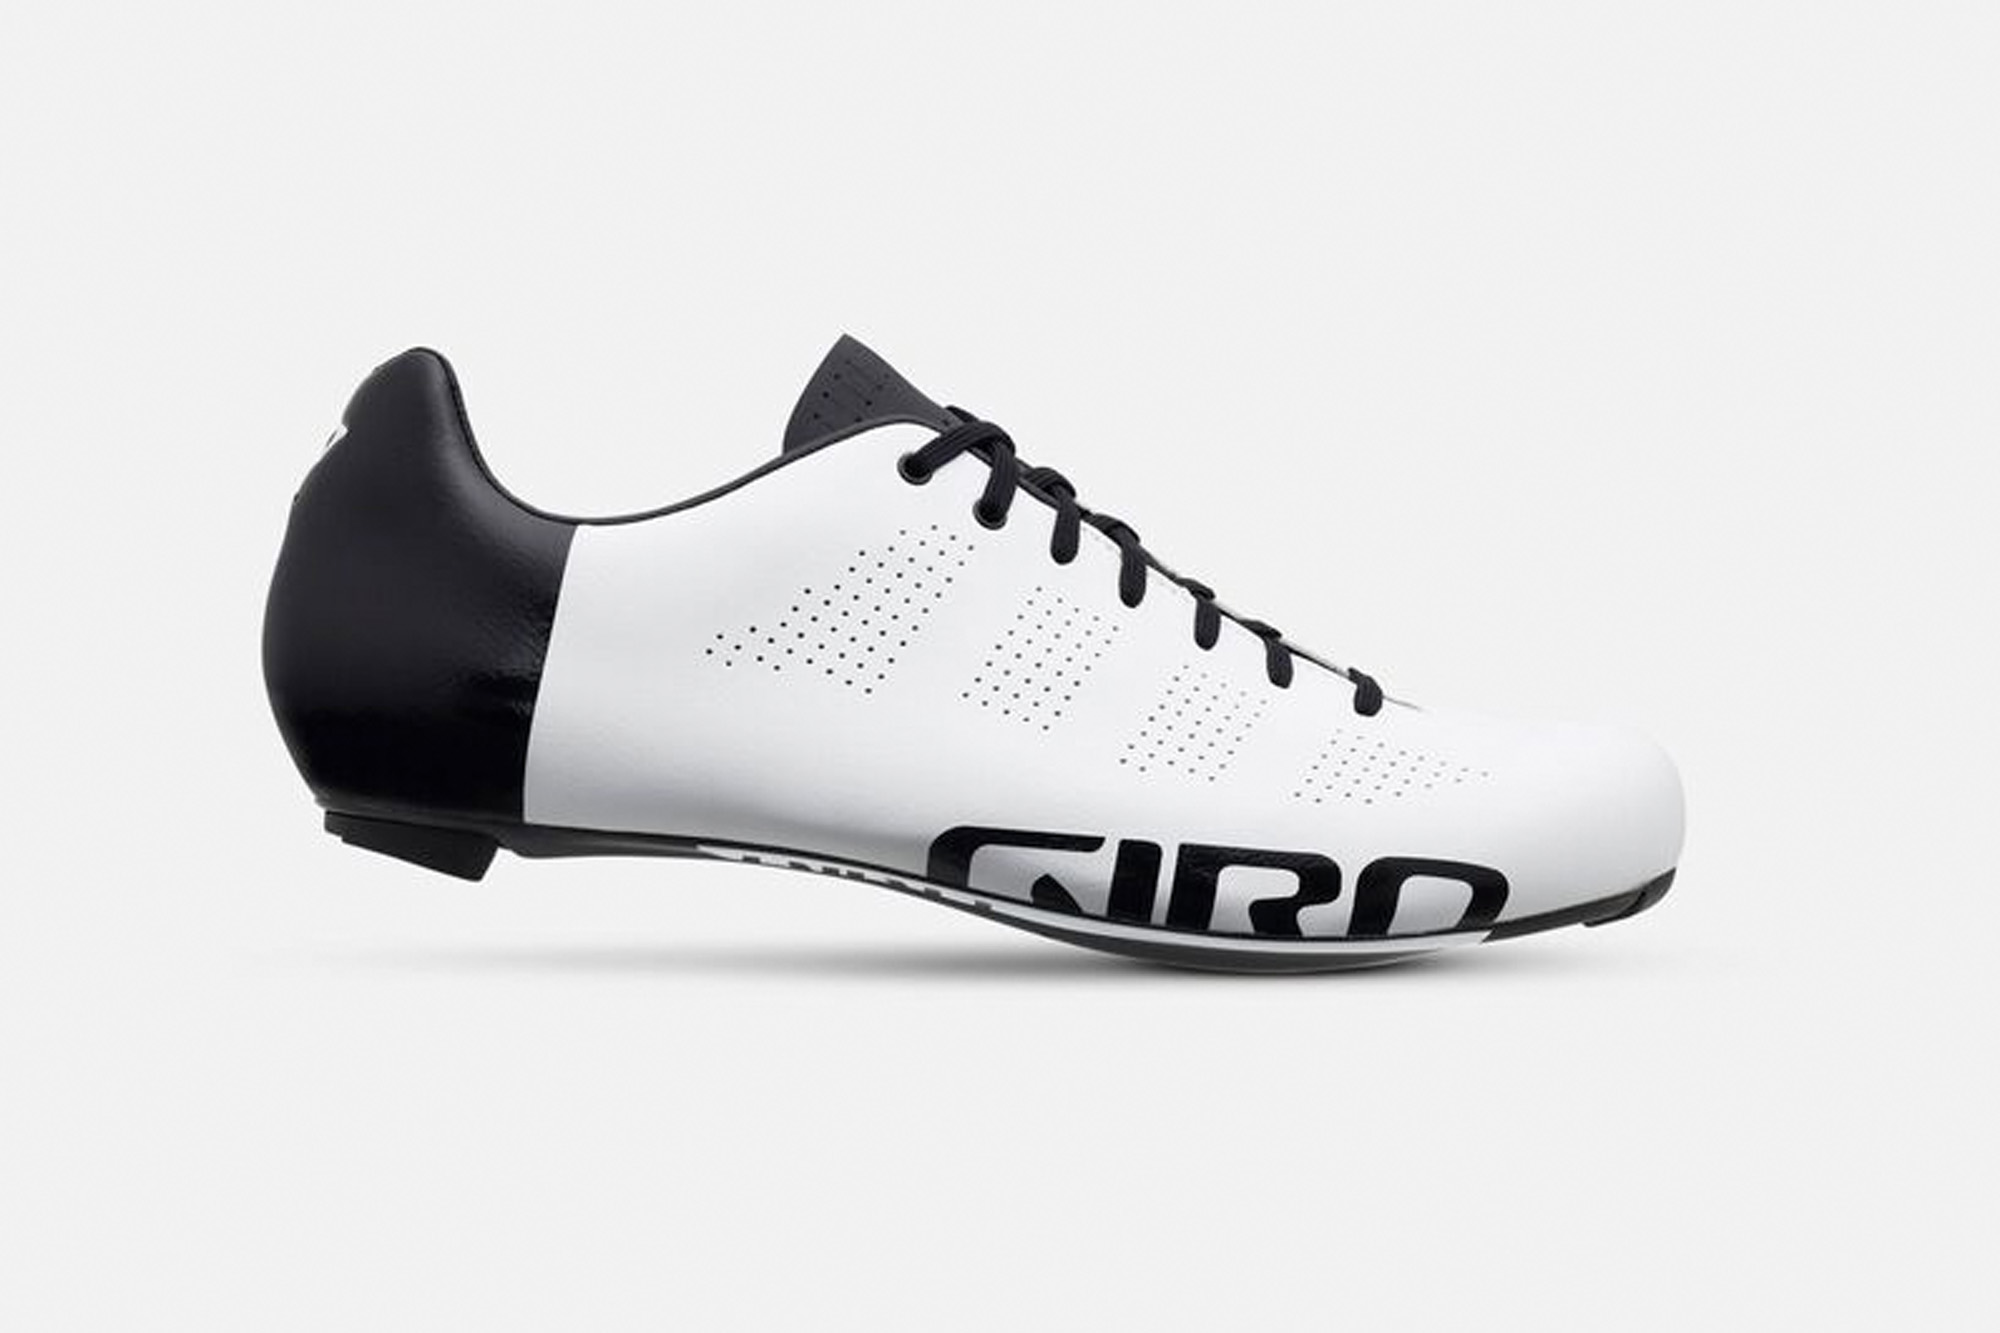 Giro cykelsko: Giro Empire ACC